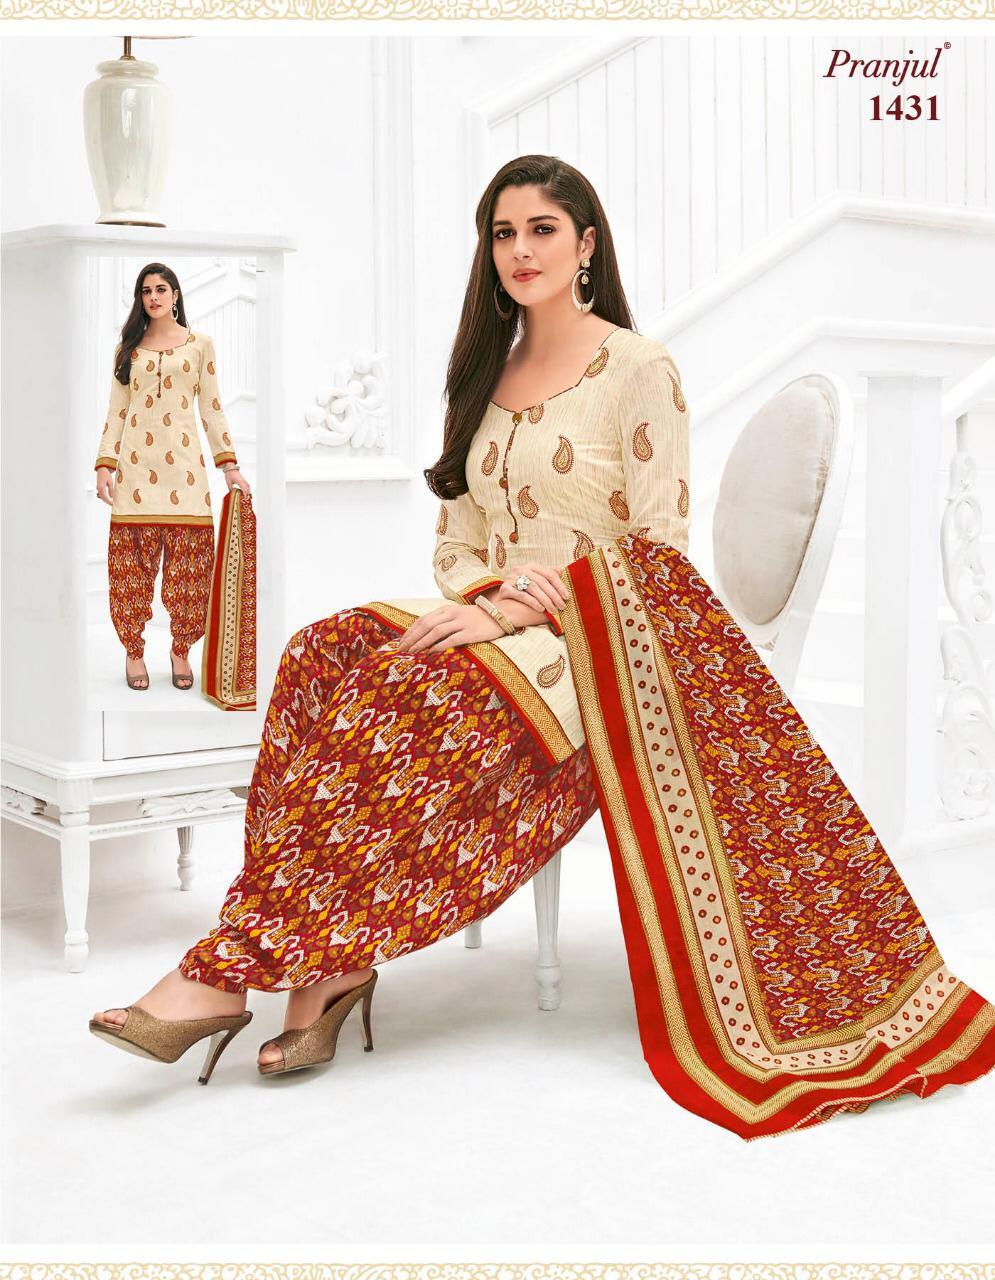 Pranjul Priyanka Vol 14 Cotton Unstitched Suits Wholesale Bo